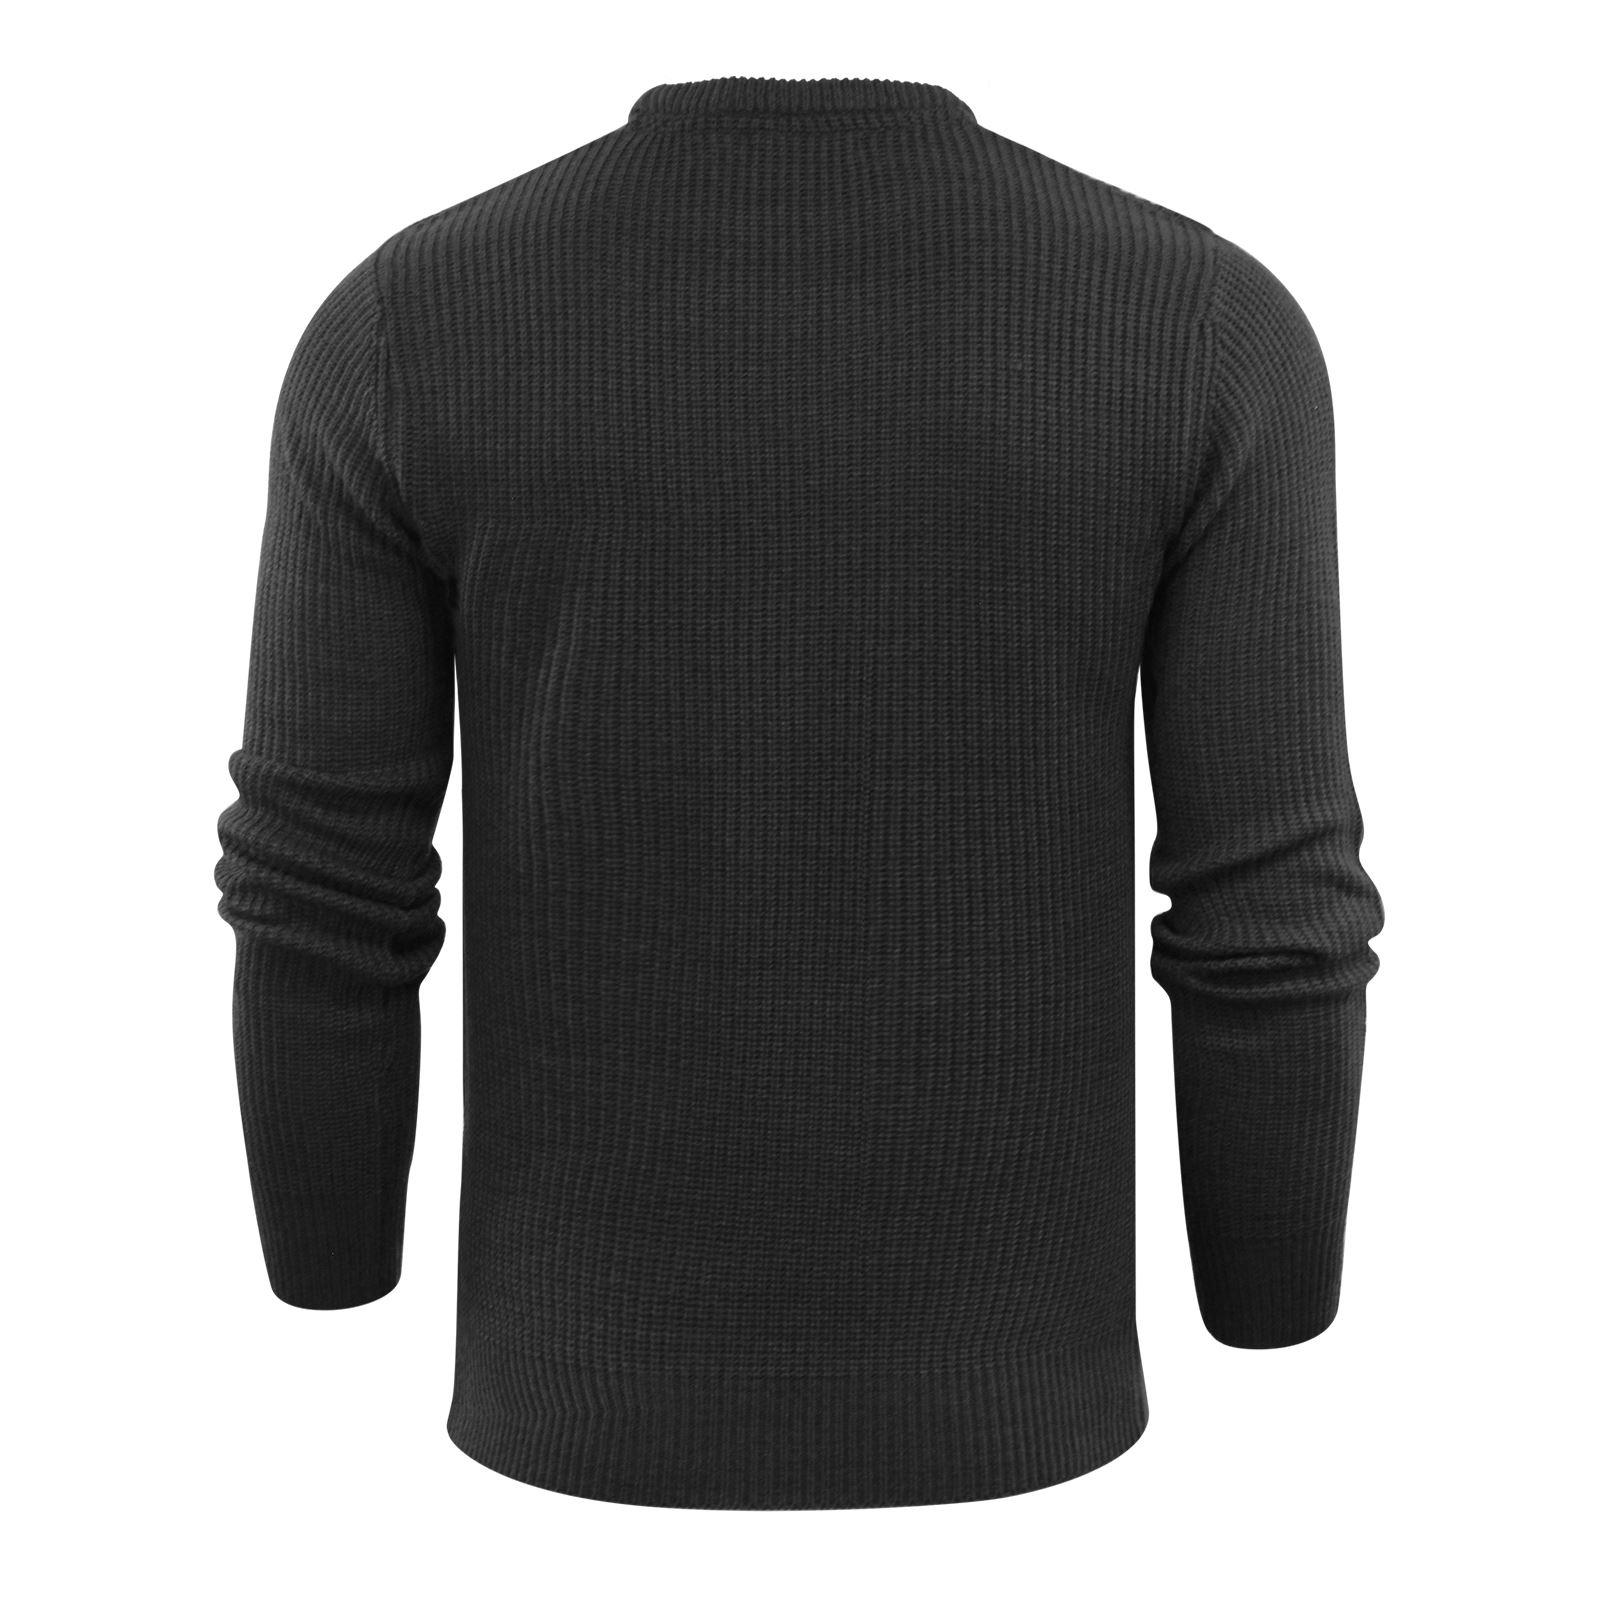 Brave-Soul-Fulton-Mens-Jumper-Kintted-Crew-Neck-Sweater thumbnail 9